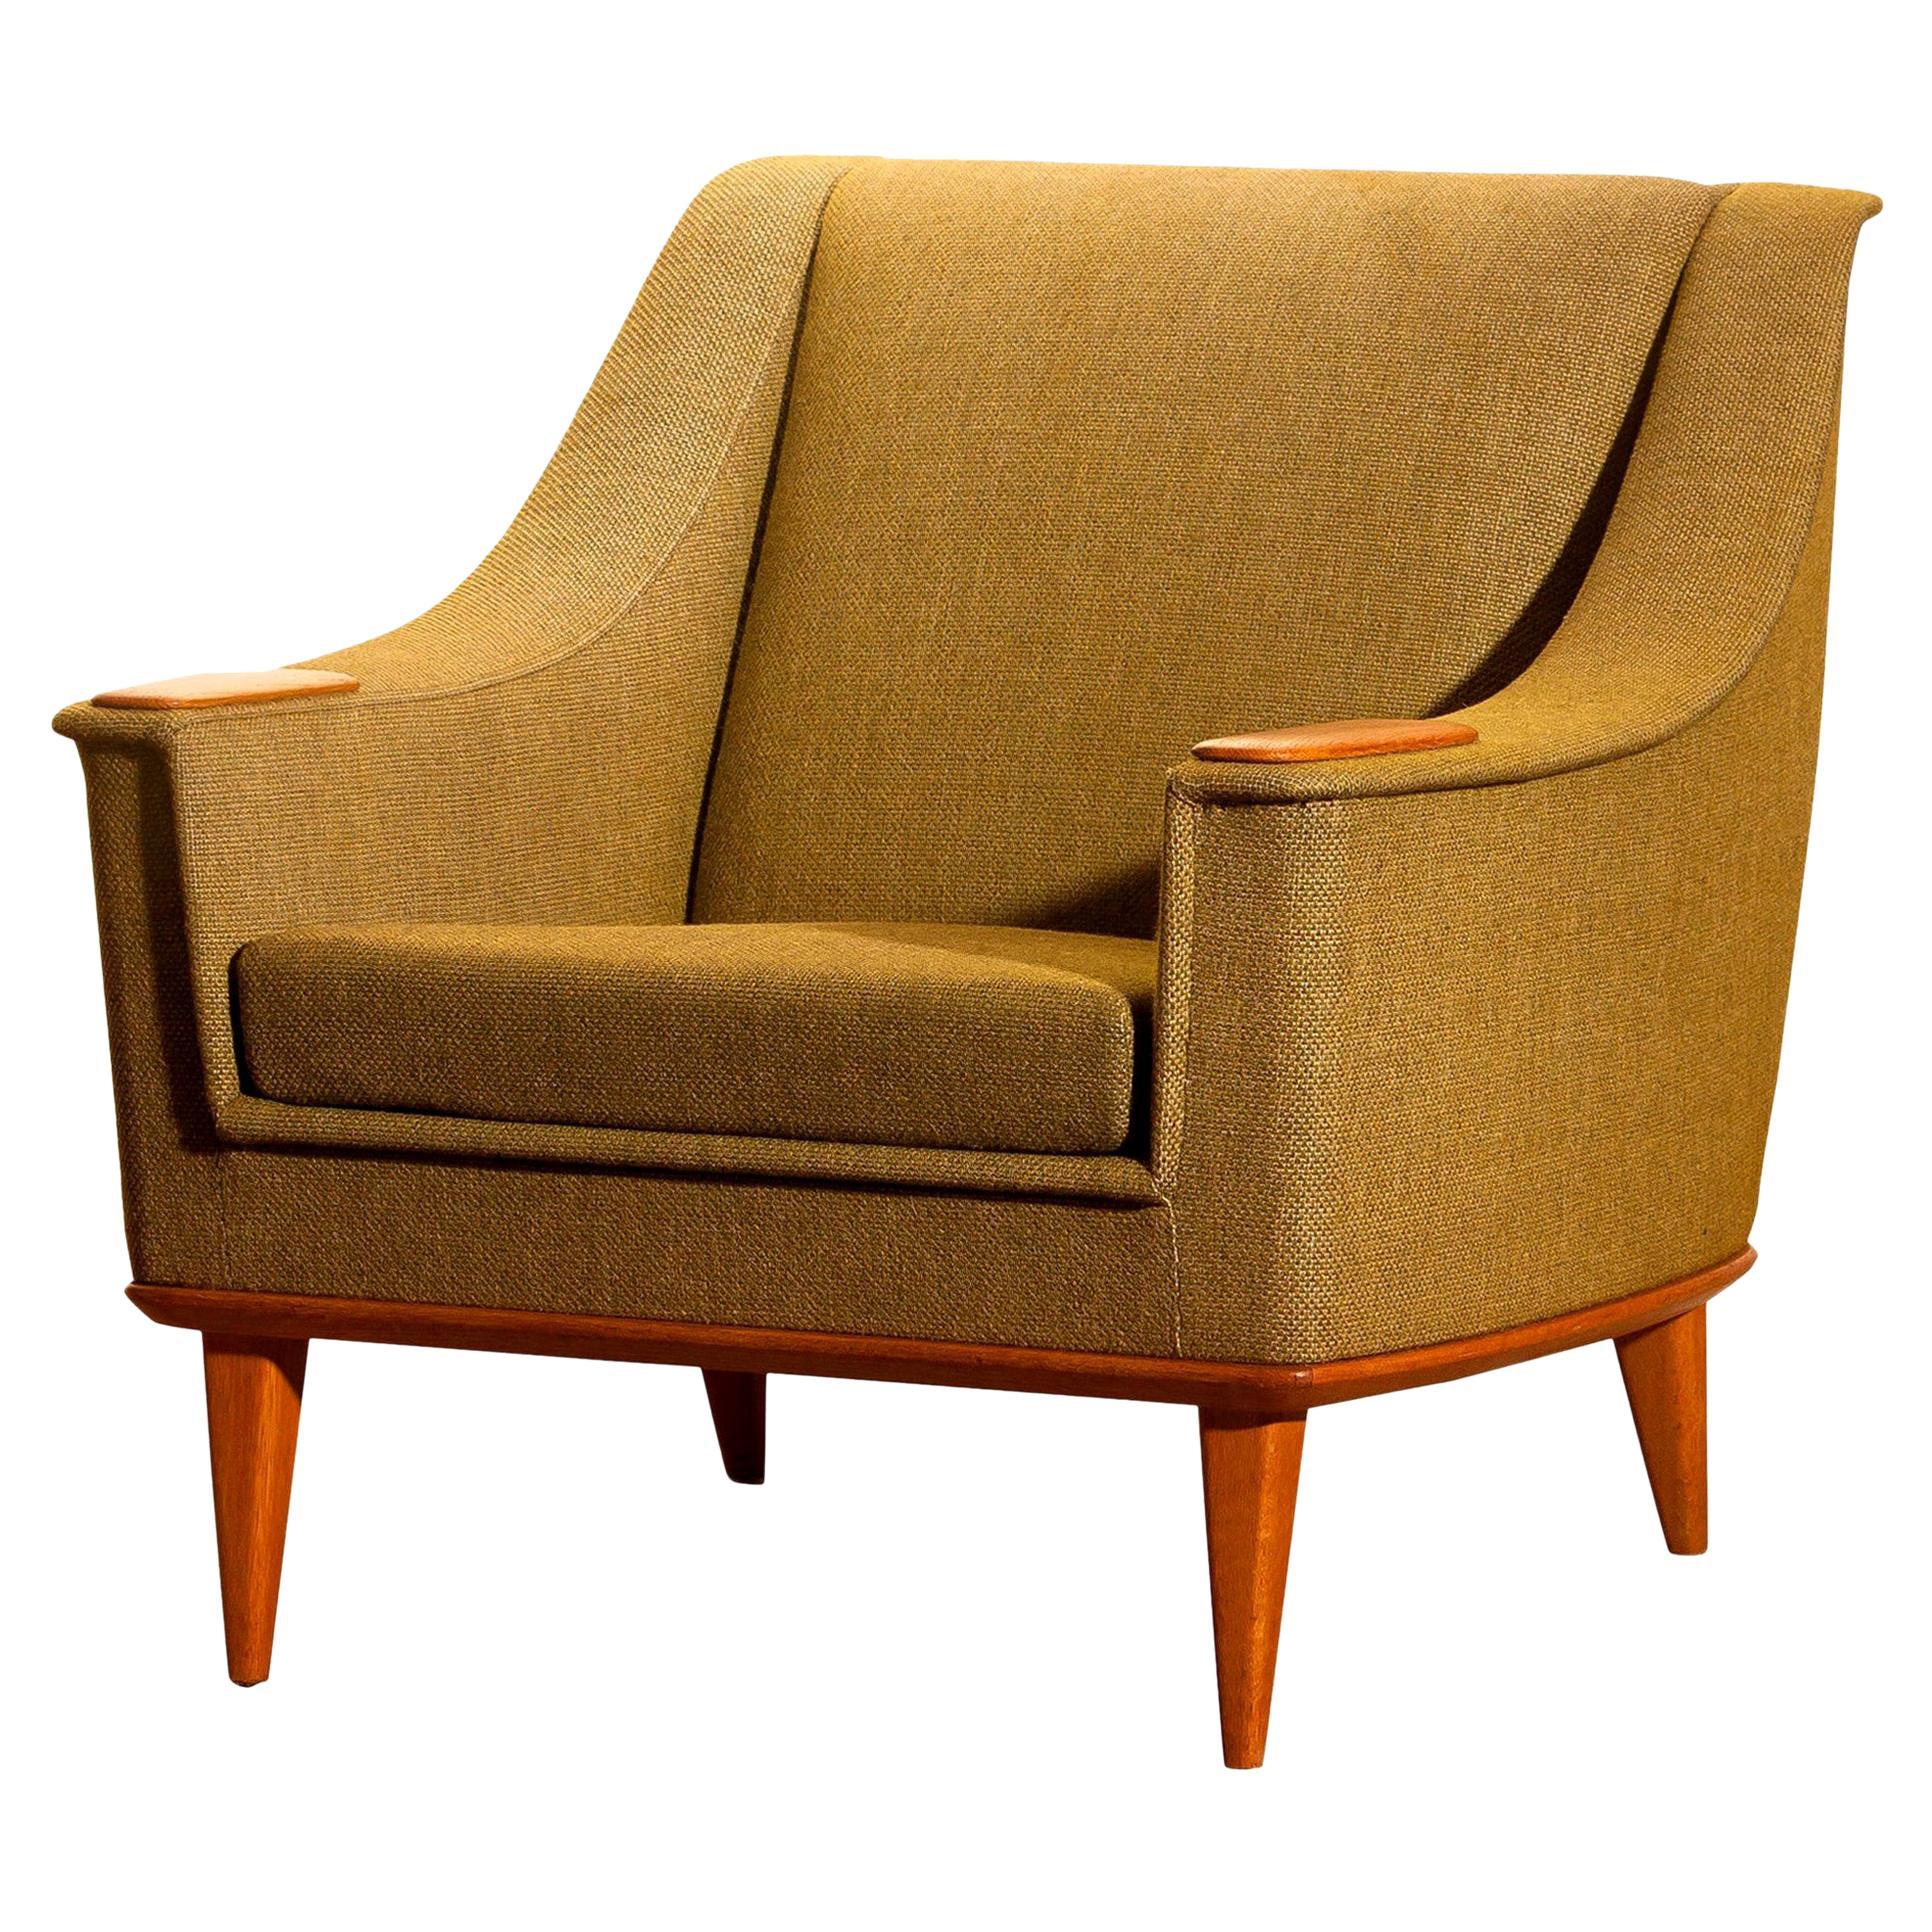 1960s, Oak Green Upholstered Lounge Chair by Folke Ohlsson for DUX, Sweden